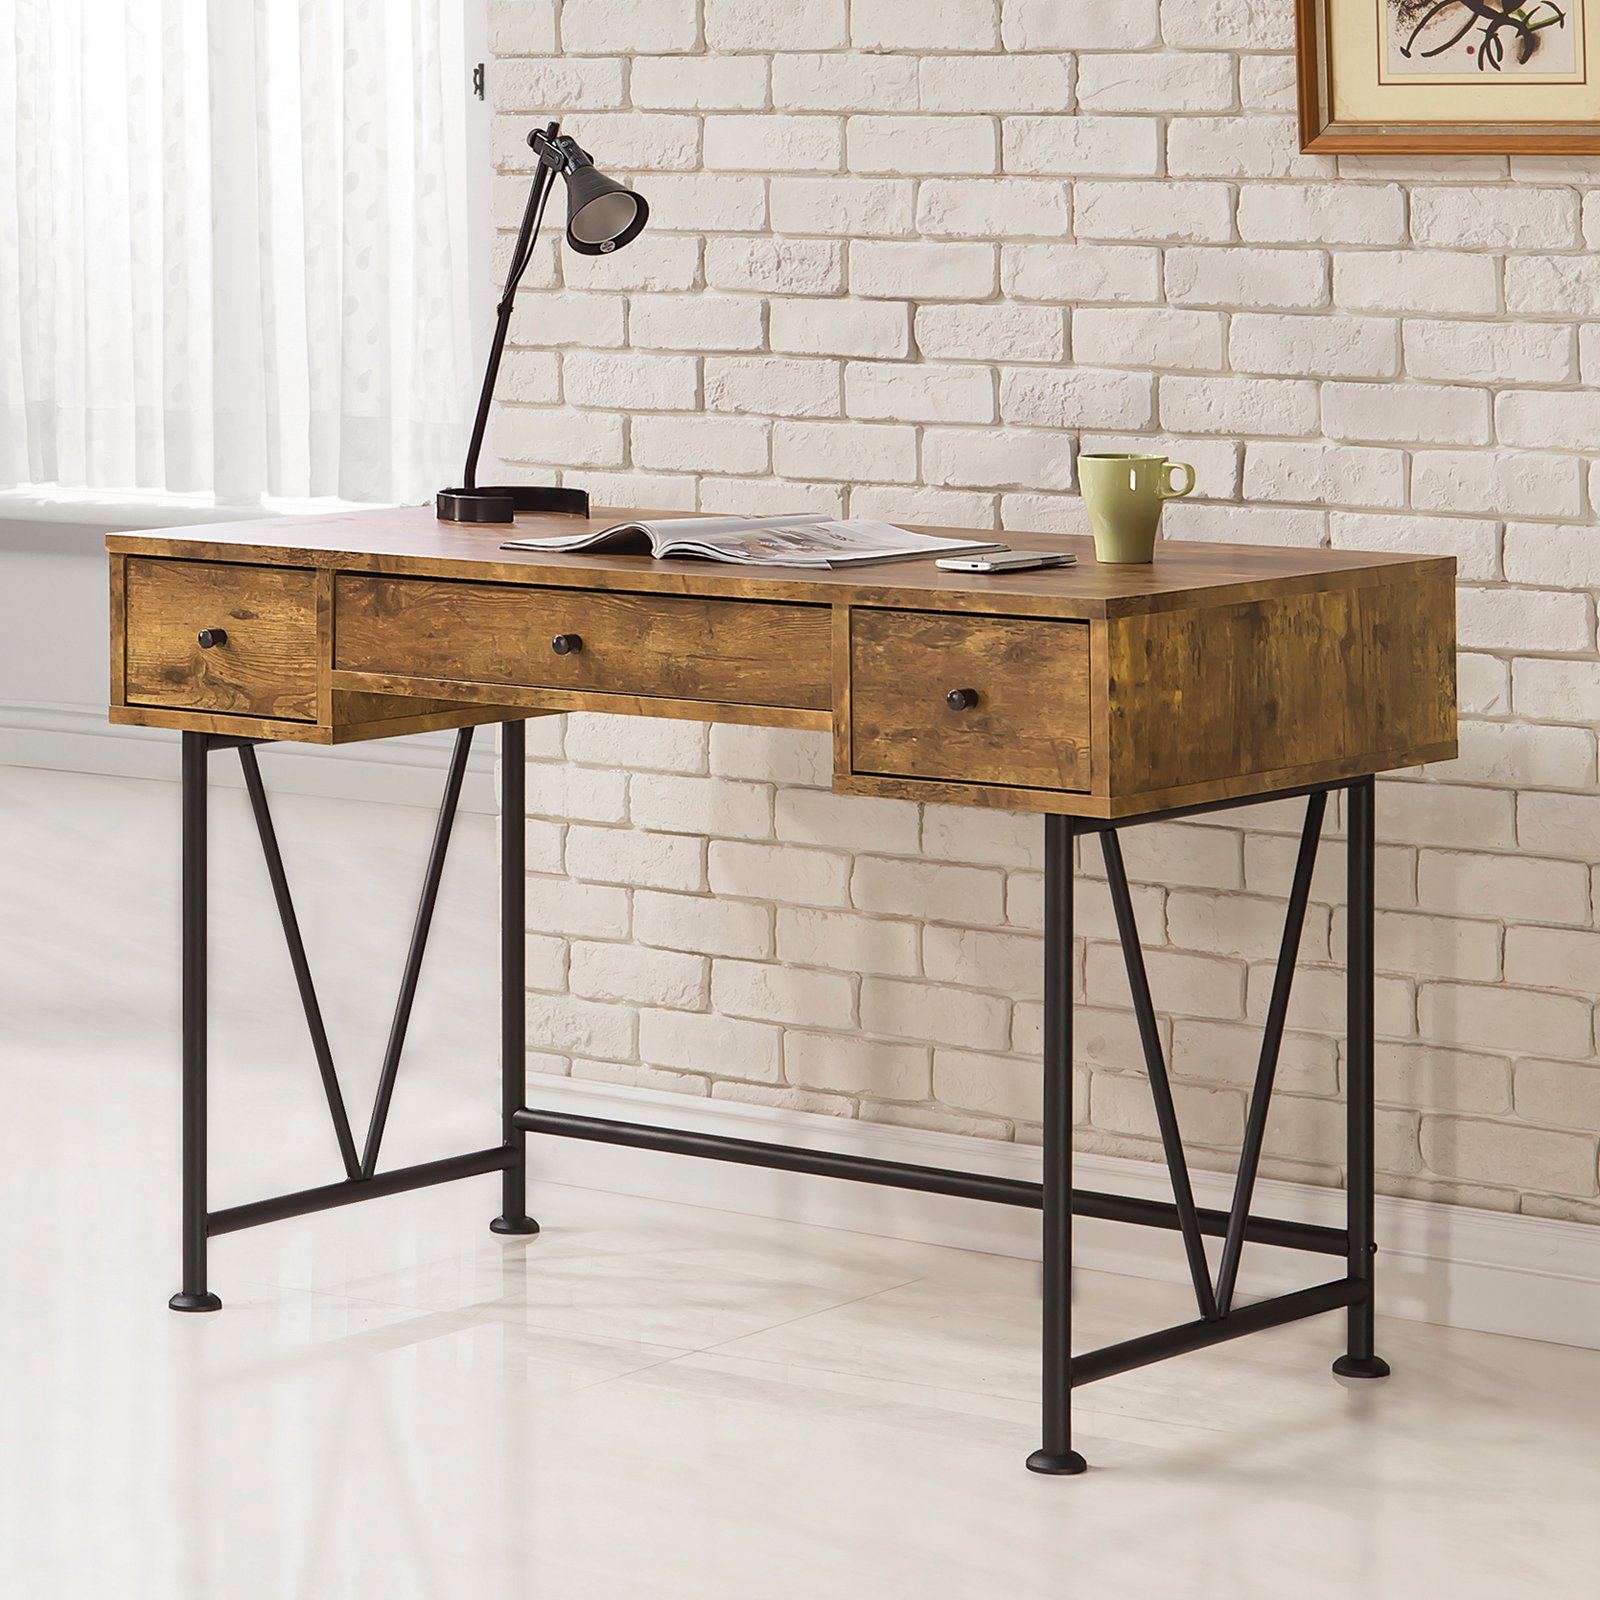 Coaster Company Writing Desk, Antique Nutmeg, Black